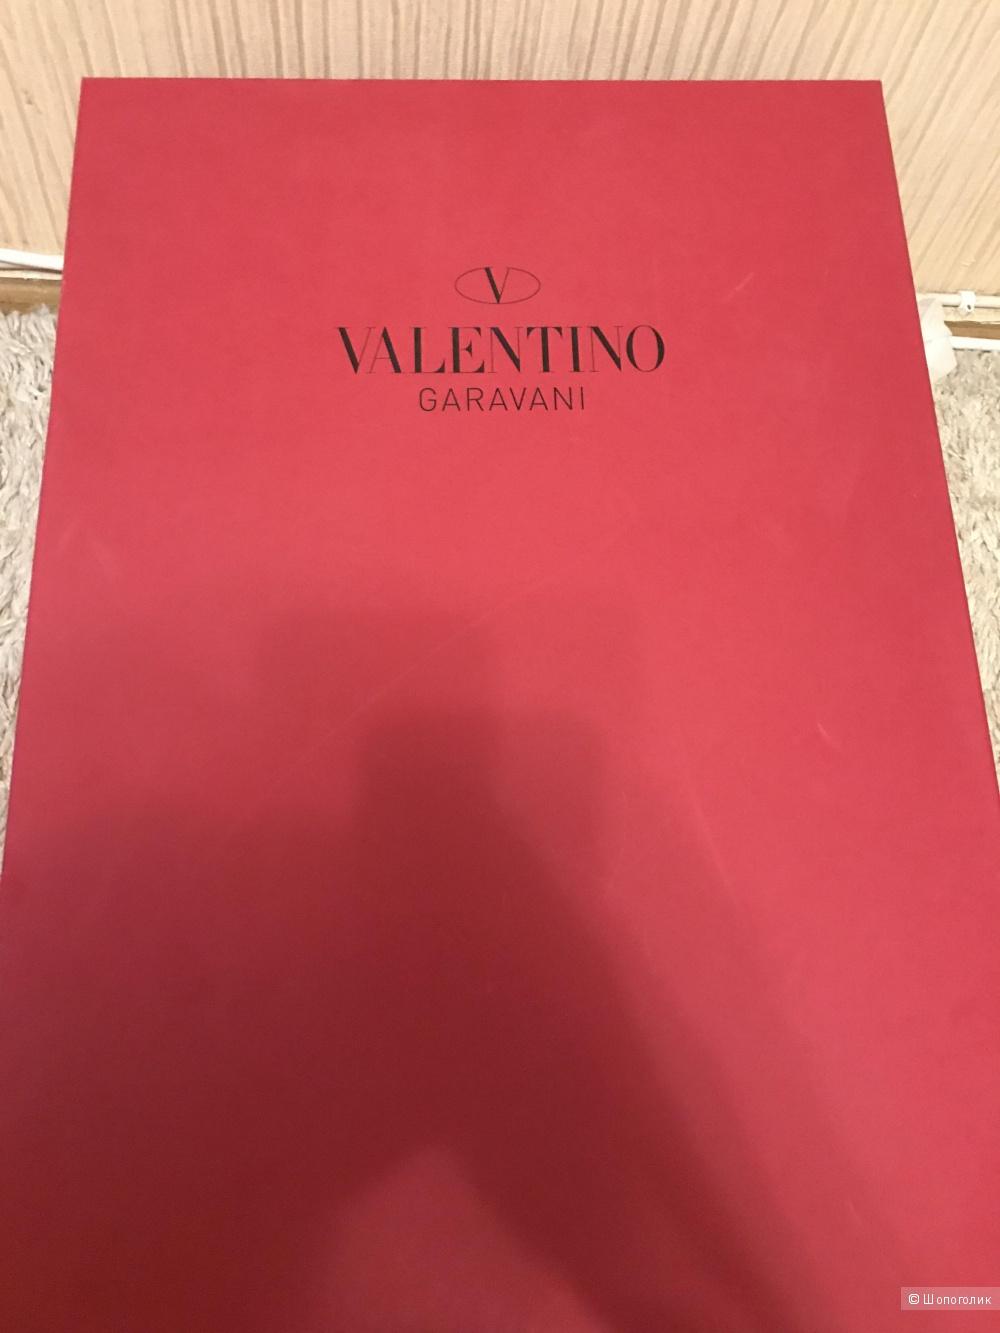 Сапоги Valentino Garavani, 39 размер